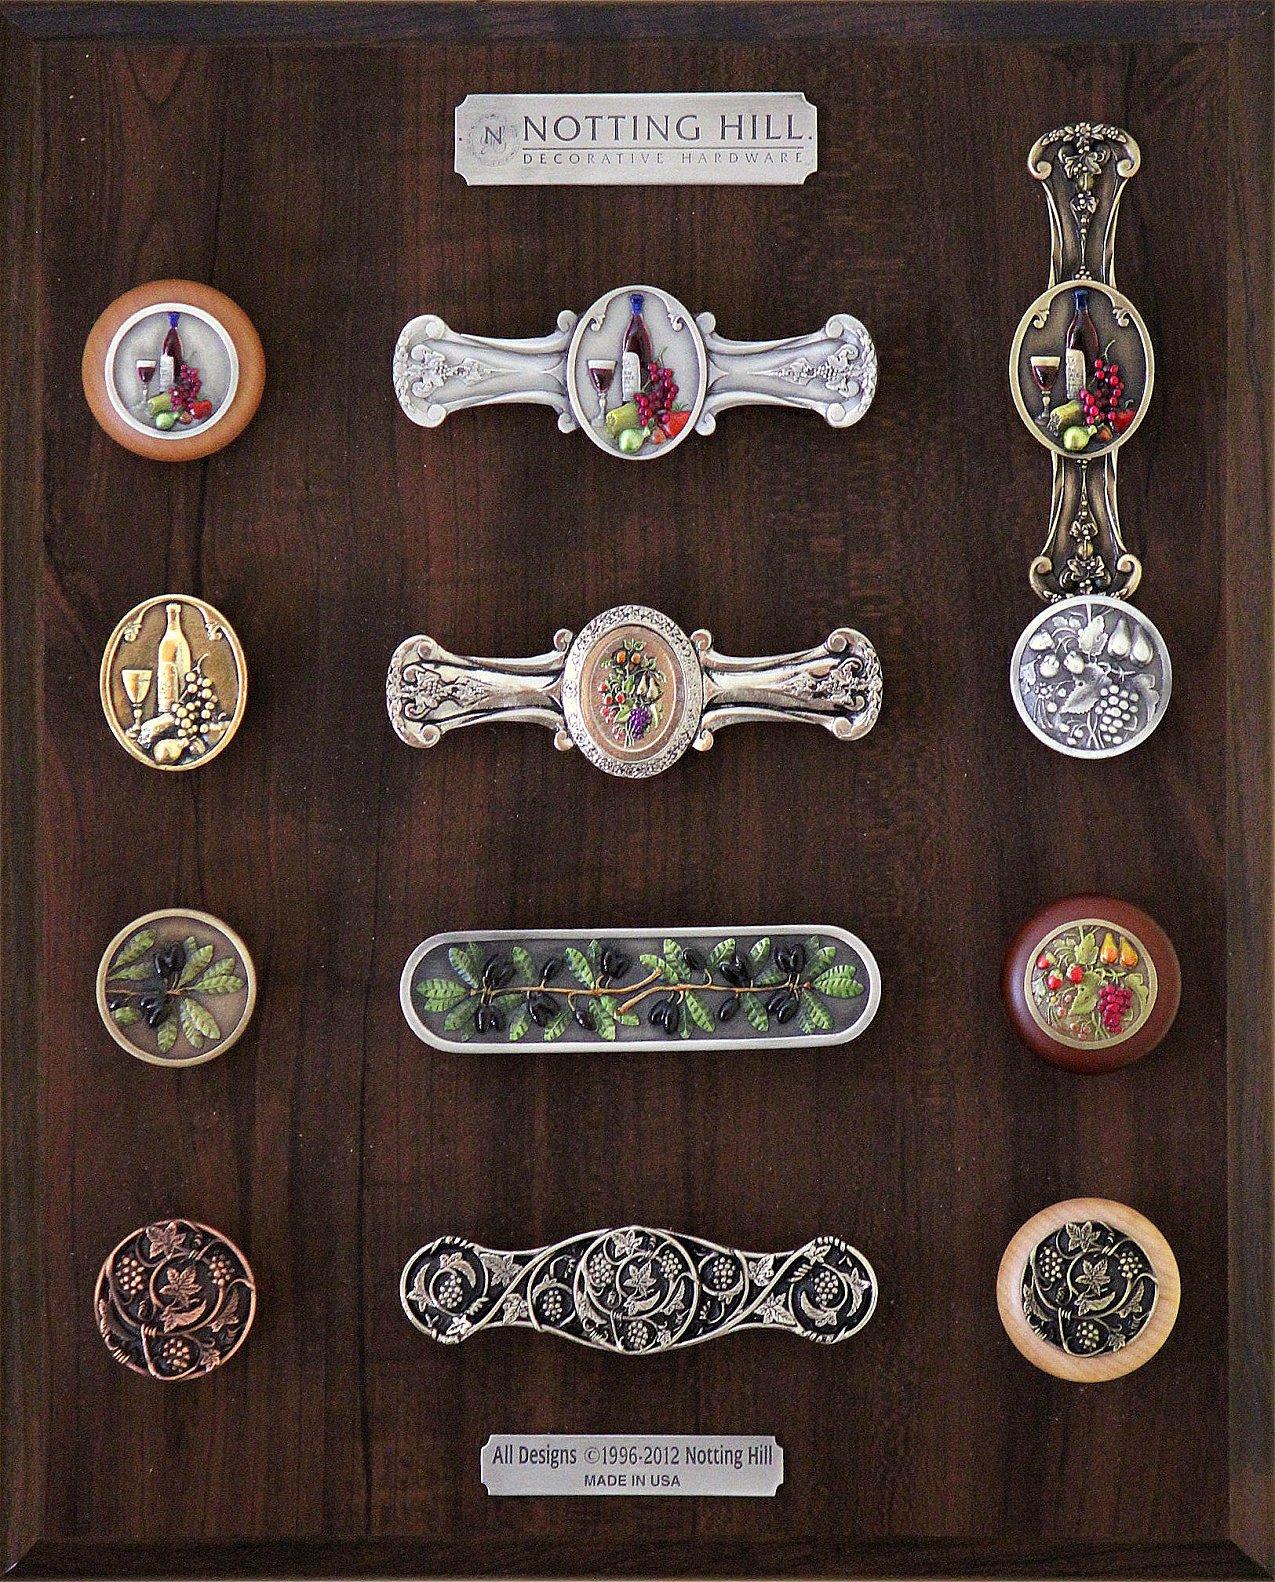 Best Cellar Wood Knob, Pull & Knob; Fruit Bouquet Knob & Pull; Tuscan Bounty Knob; Olive Branch Knob & Pull; Tuscan Bounty Wood Knob; Grapevines Knob, Pull & Wood Knob.